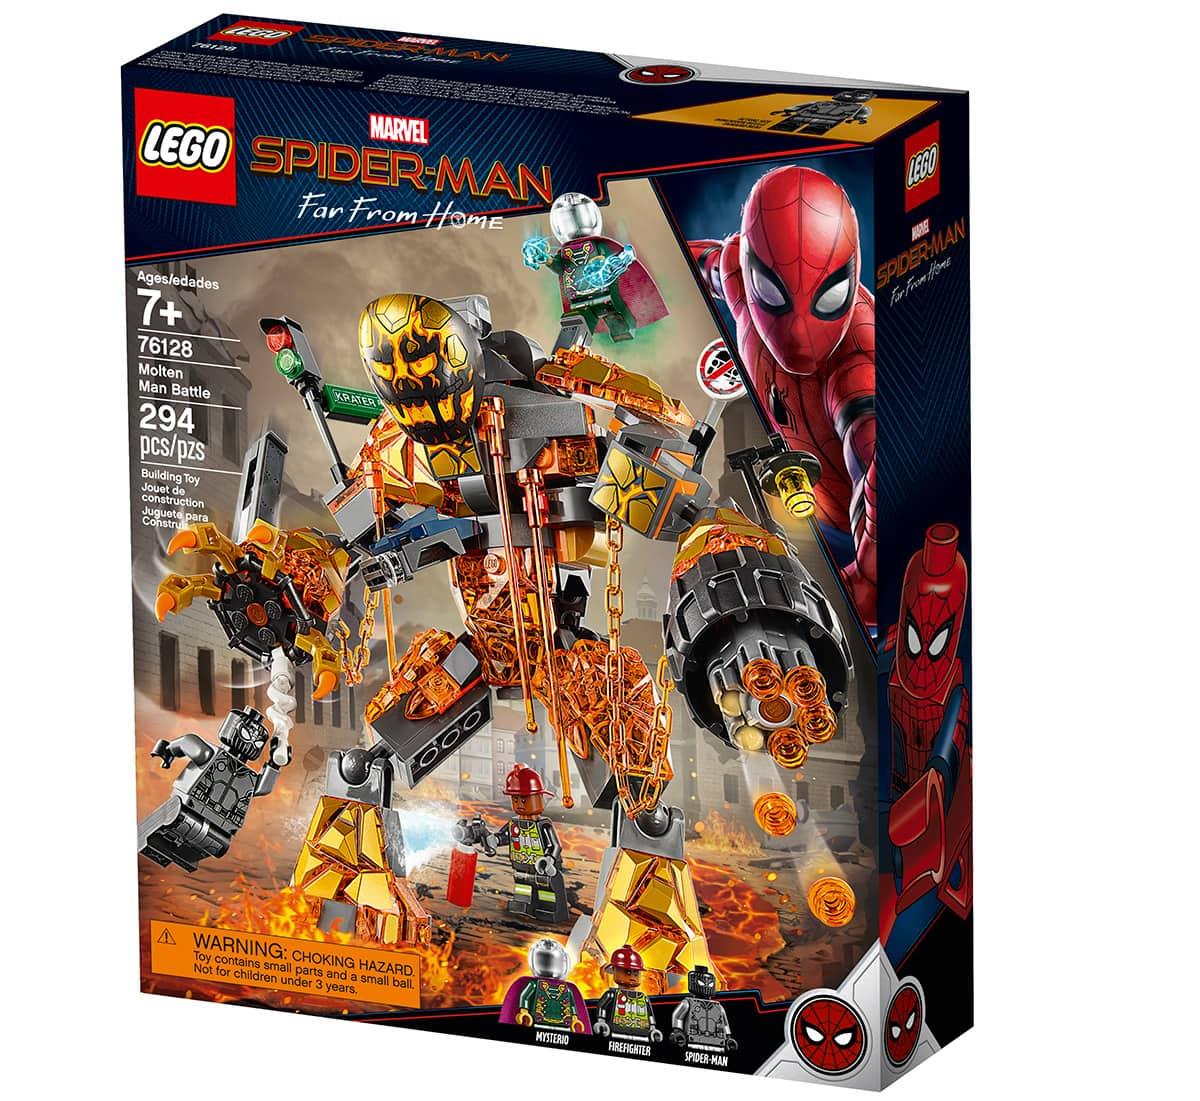 LEGO Spider-Man Far From Home Molten Man Battle 76128